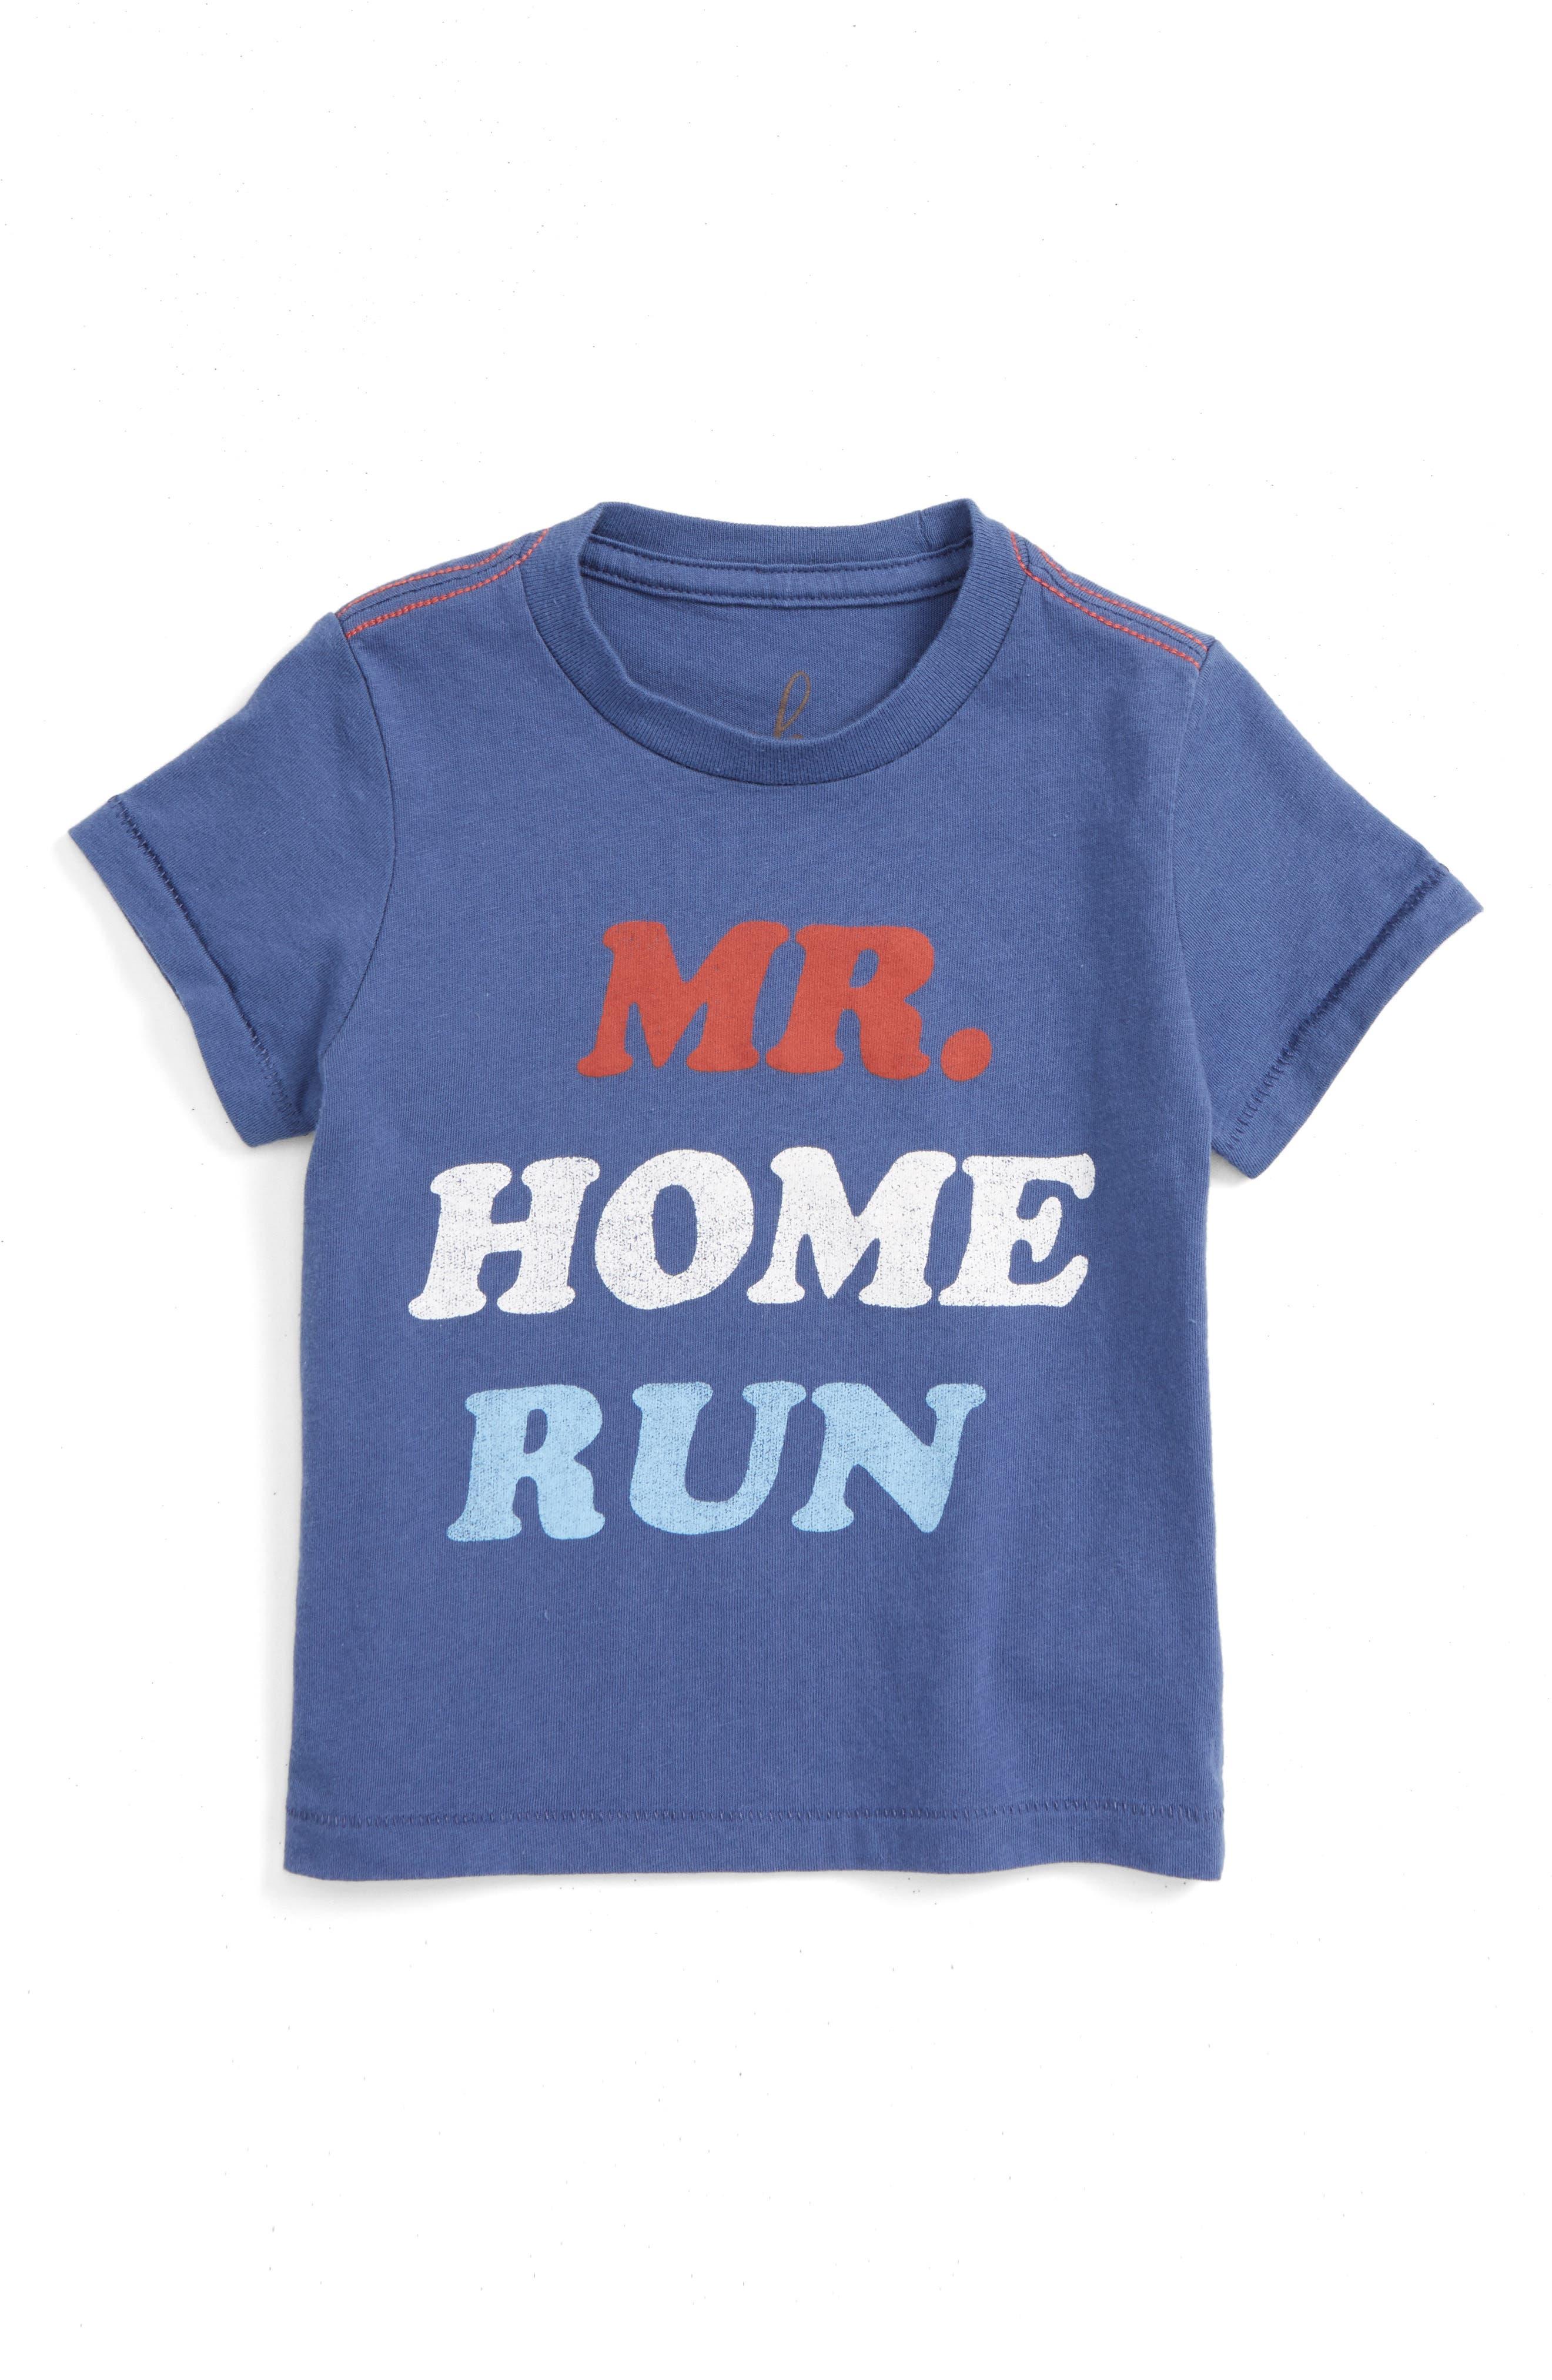 Alternate Image 1 Selected - Peek Mr. Home Run T-Shirt (Baby Boys)